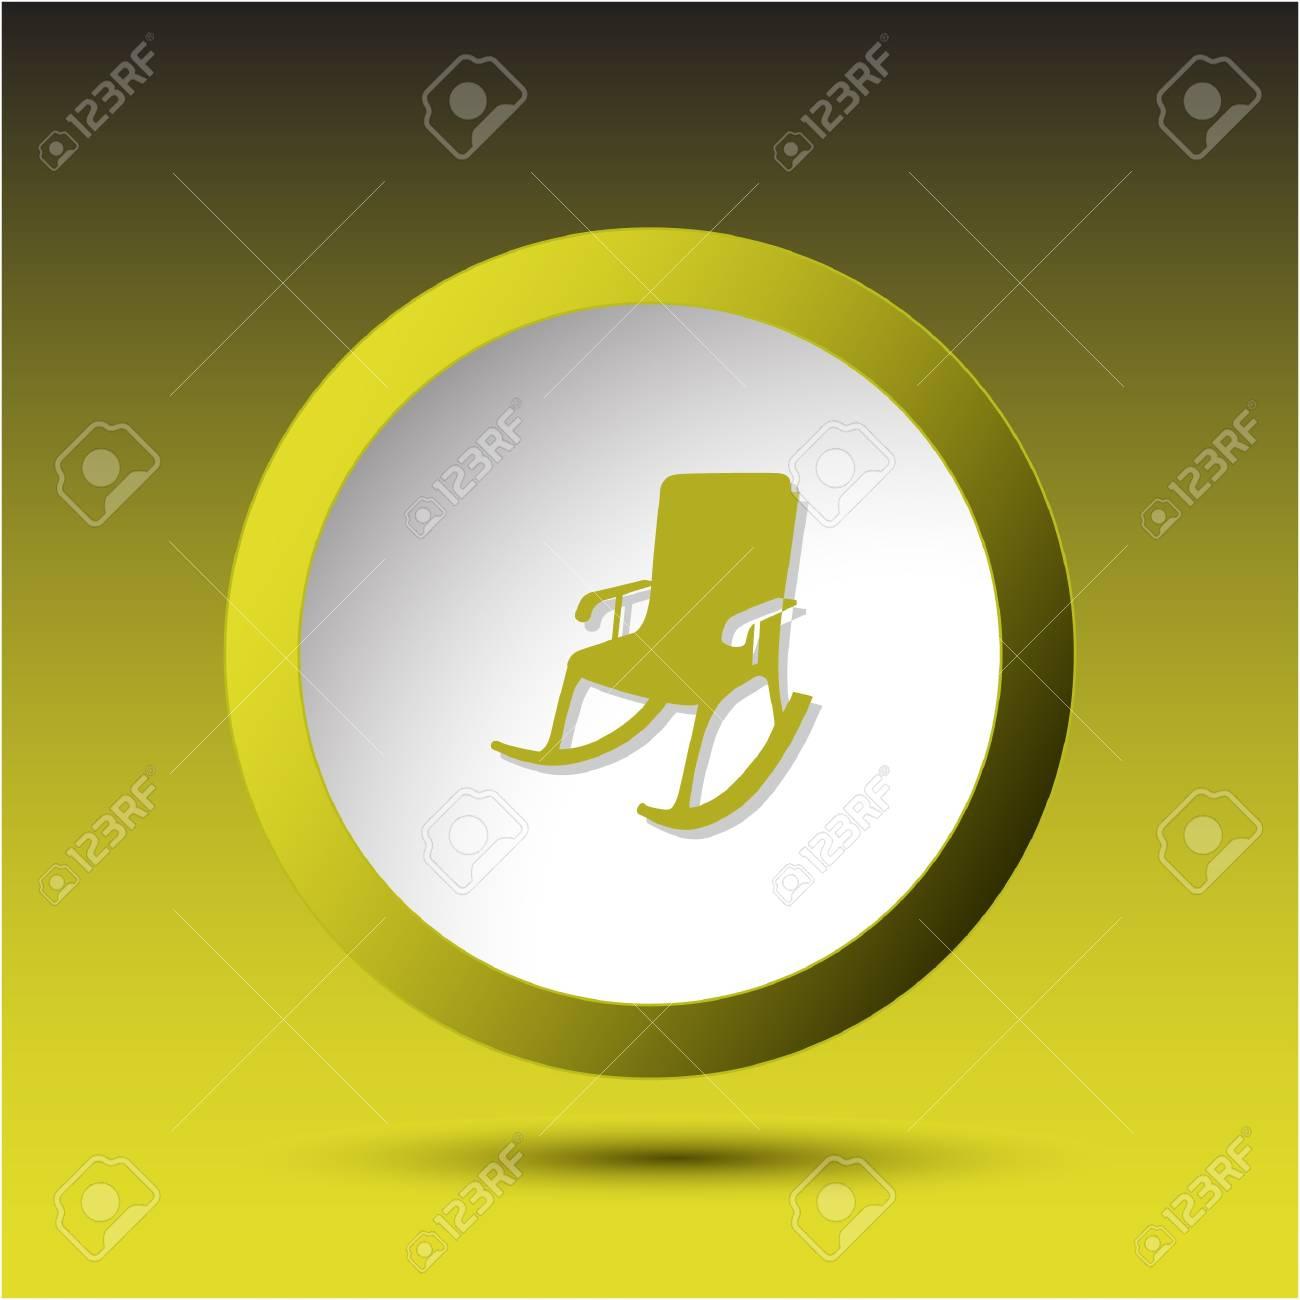 Armchair. Plastic button. Stock Photo - 15550897